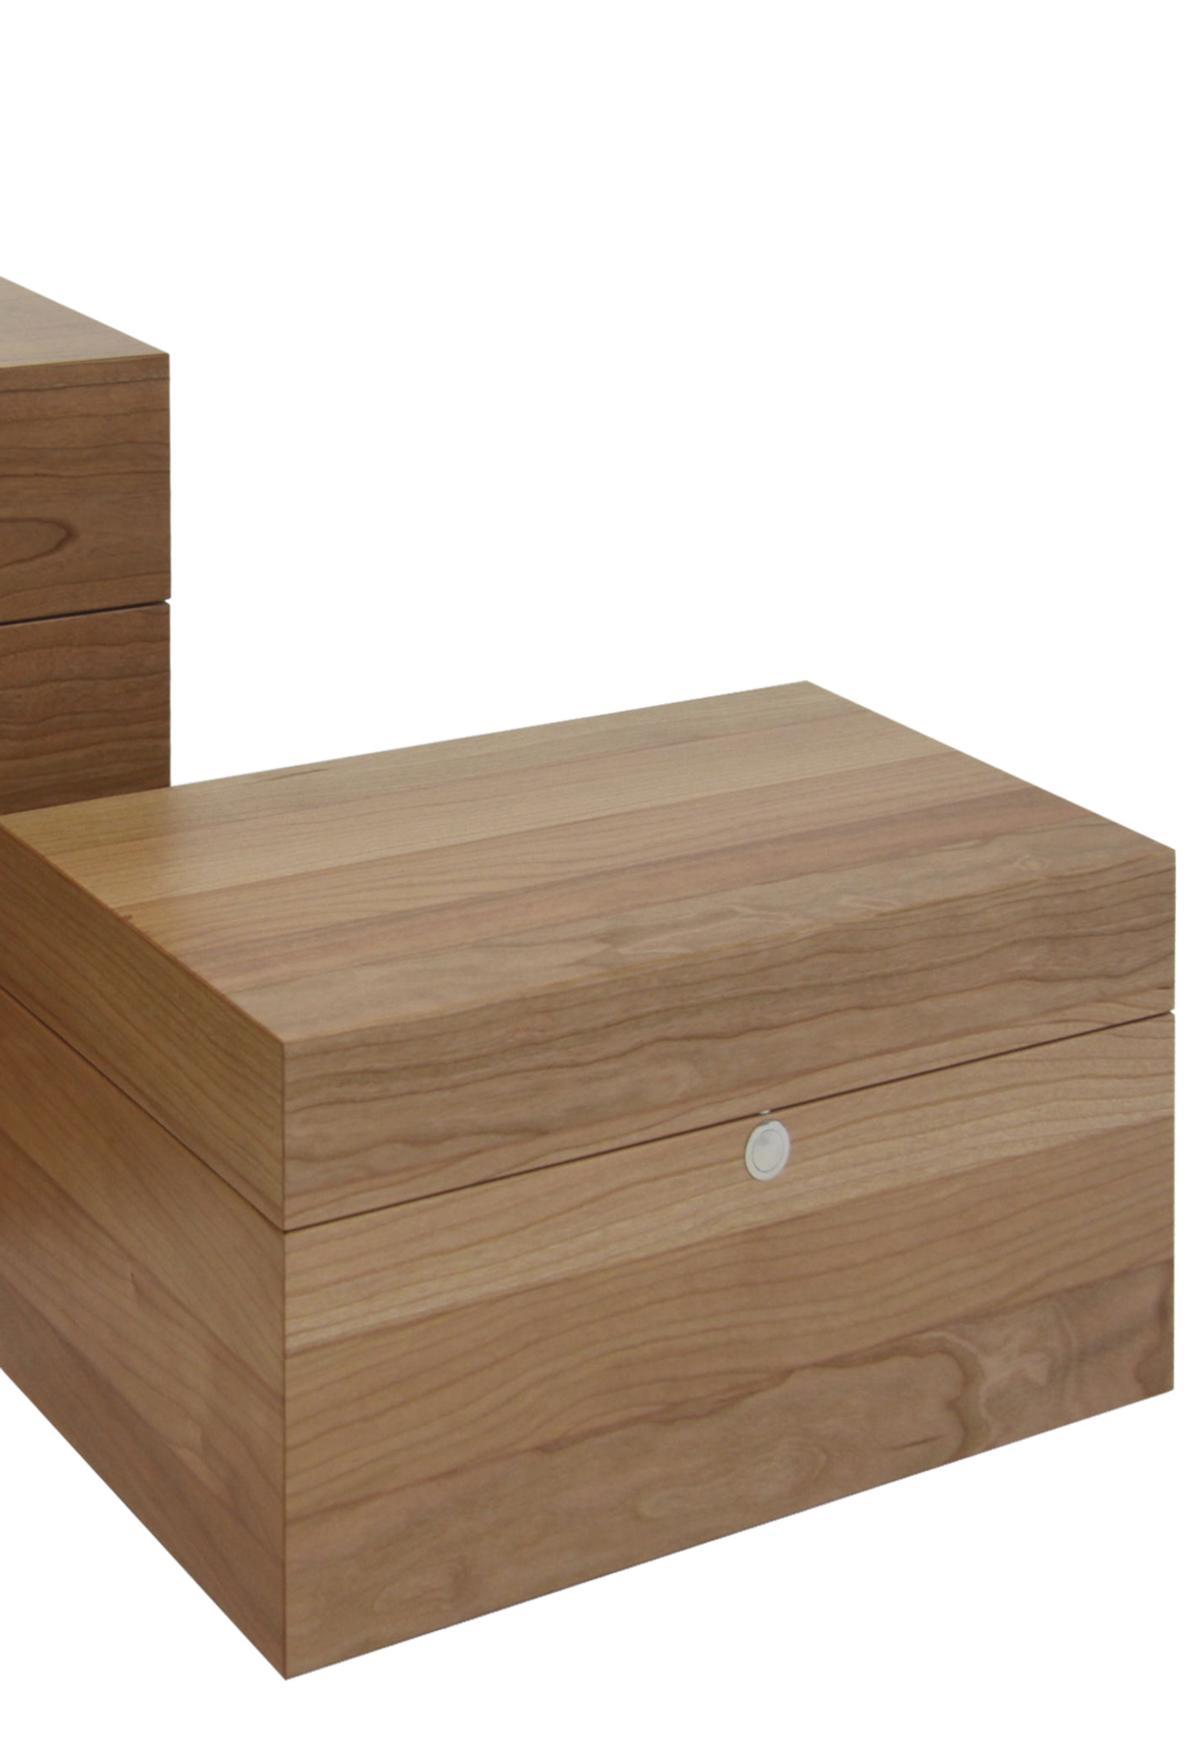 GERBER Humidor Monolith Druckknopf